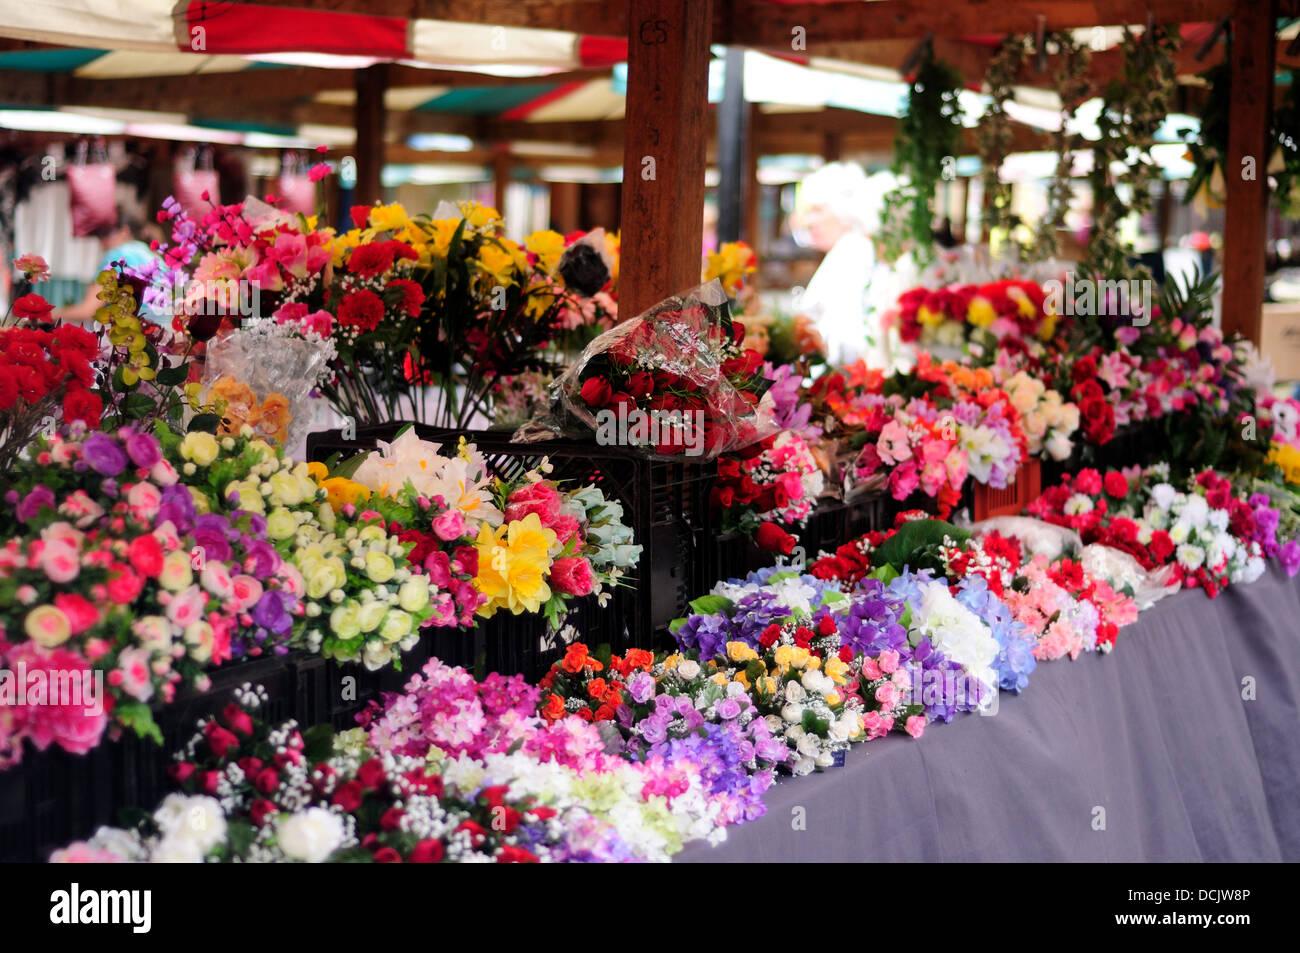 Flowers funerals stock photos flowers funerals stock images alamy chesterfield outdoor marketproducts for funerals and tombstones stock image izmirmasajfo